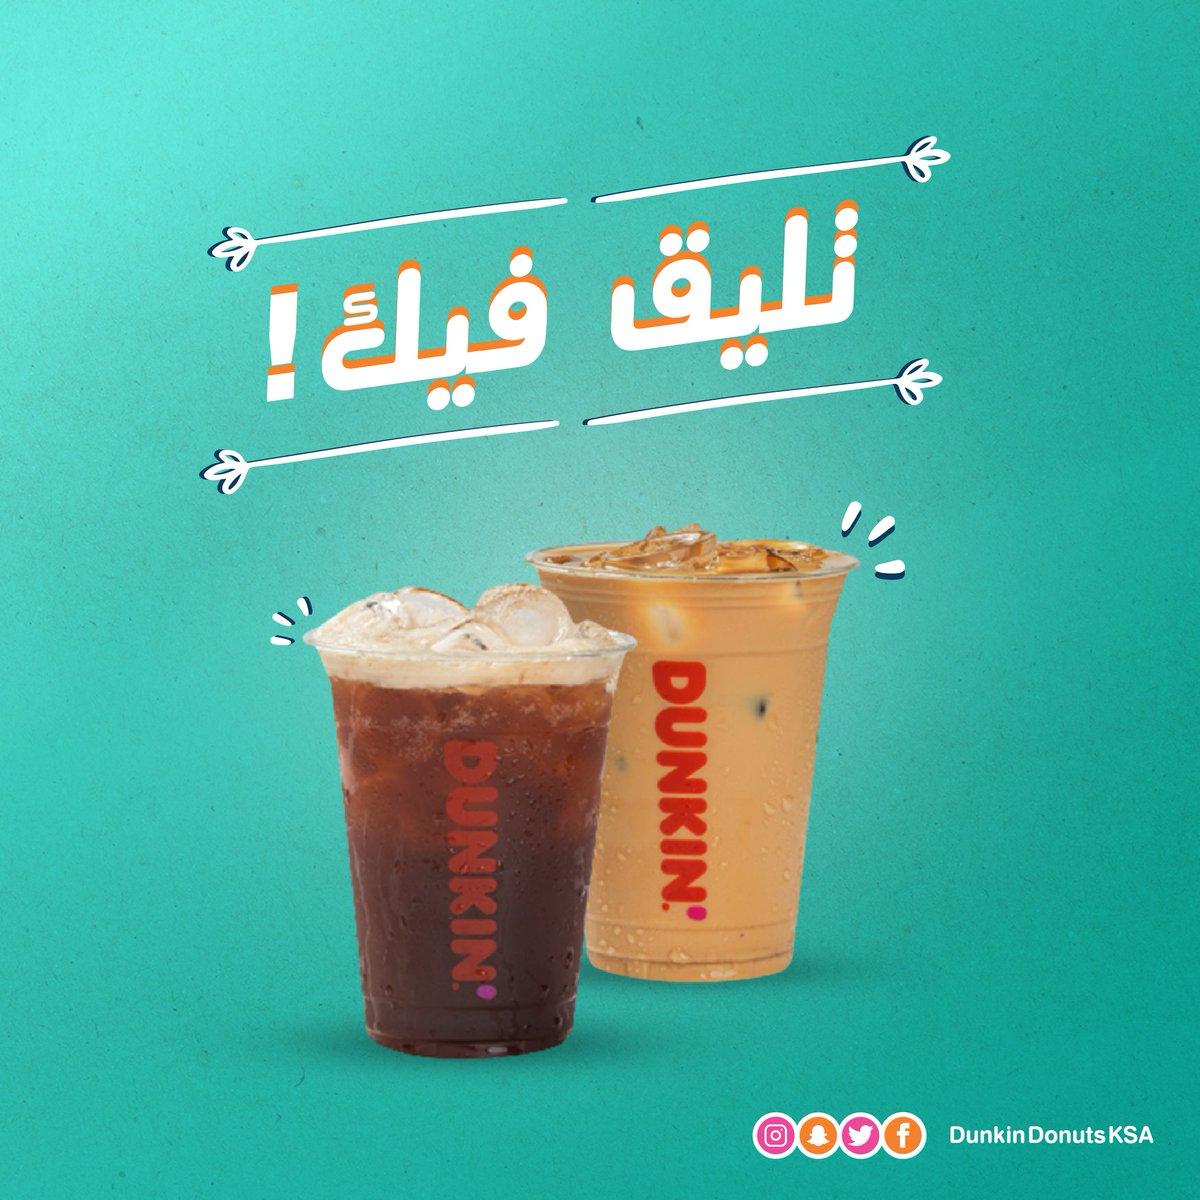 قهوة #دانكن تستاهلك   وتليق فيك!😌🧡 https://t.co/HuMFLXGxjU